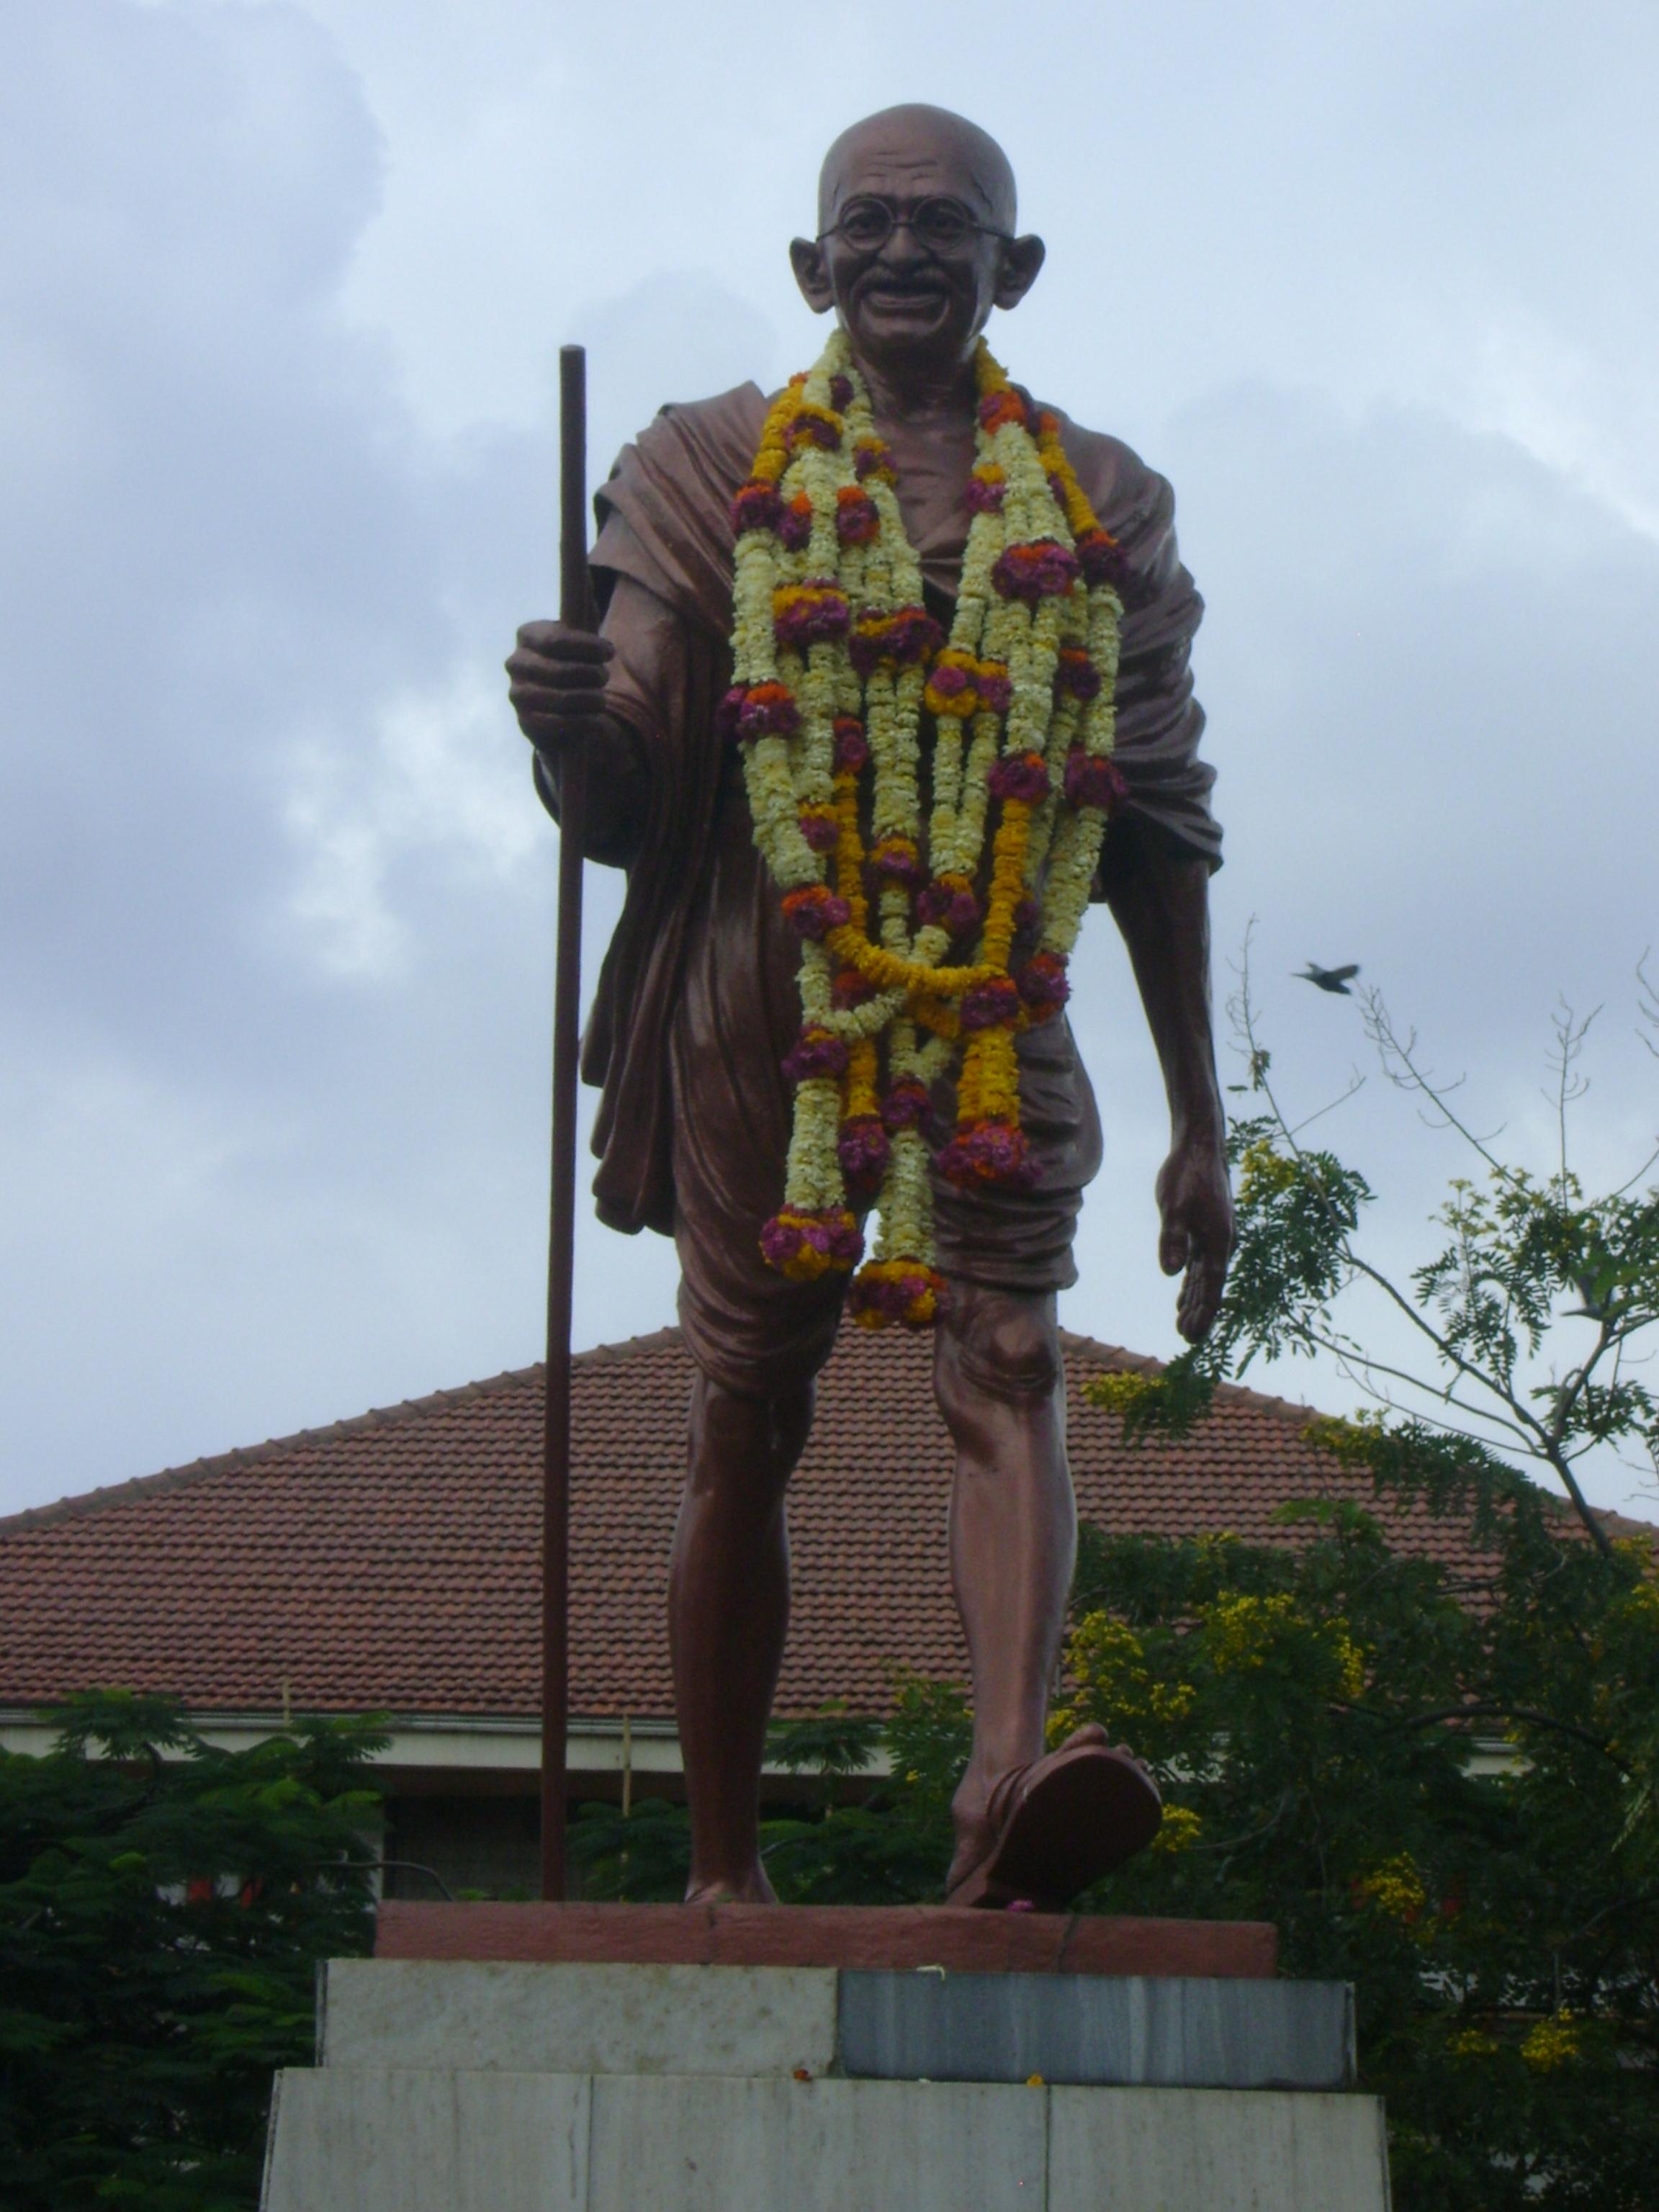 FileStatue of Mahatma Gandhi at Pune Railway Station on